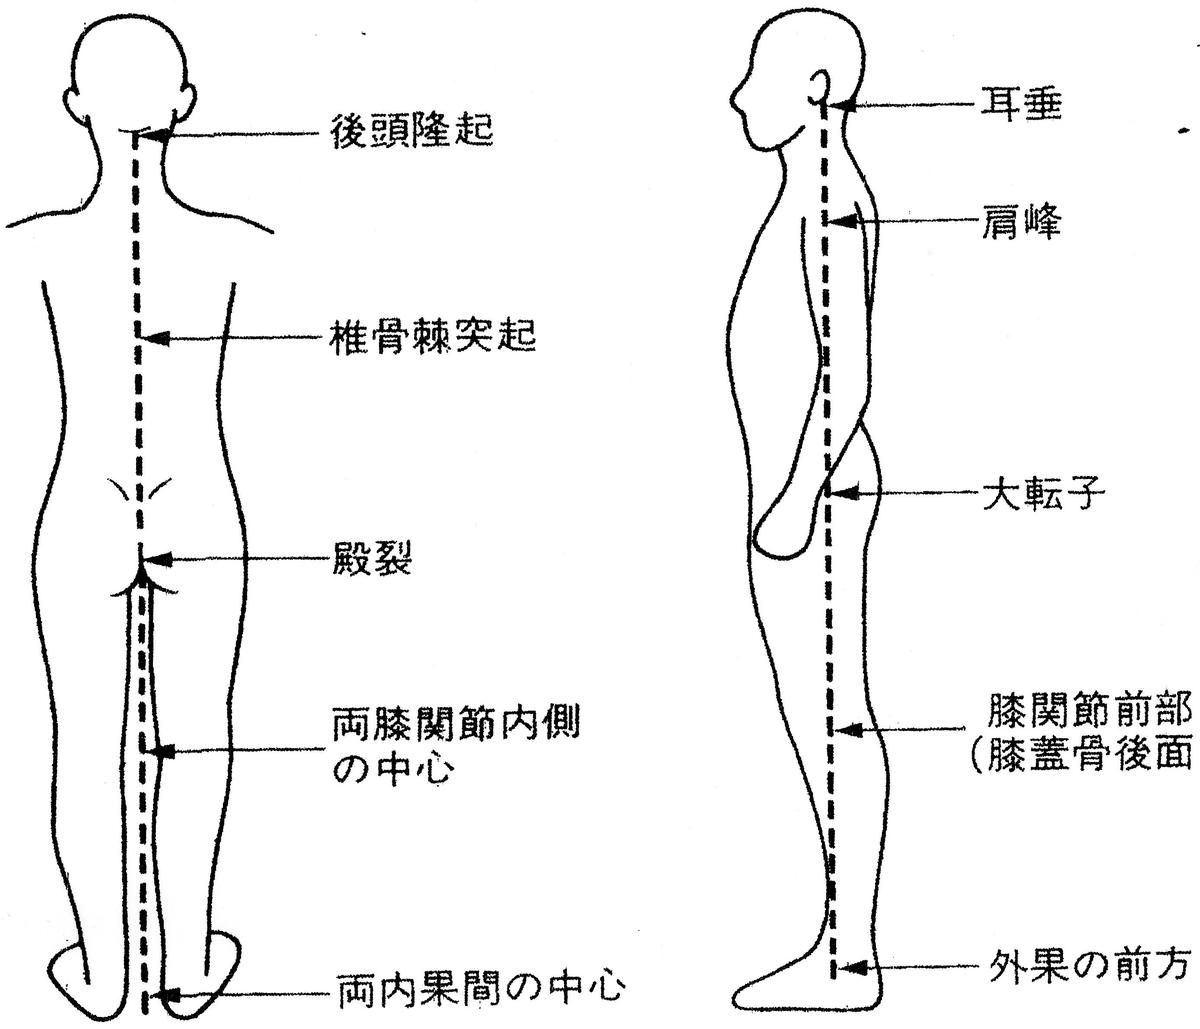 f:id:hassamu-nishimachi:20190525093036j:plain